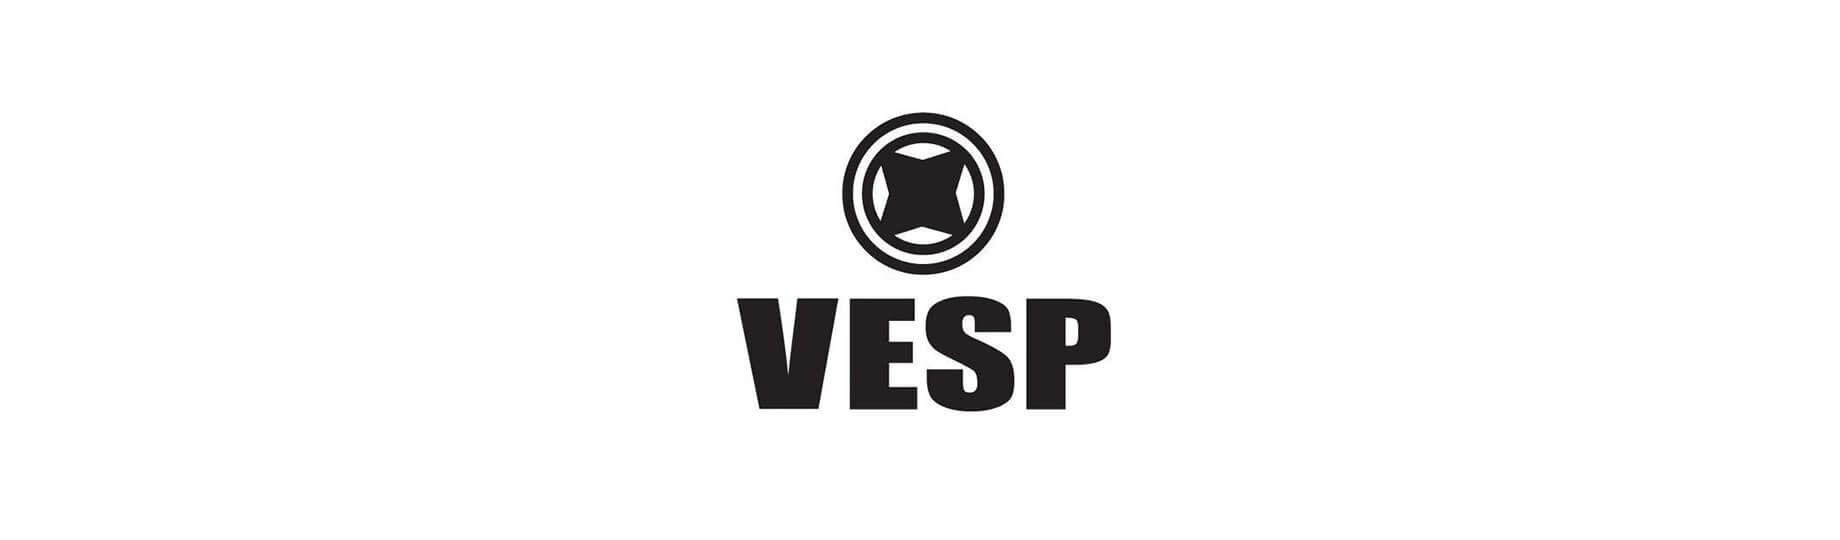 VESPメイン画像